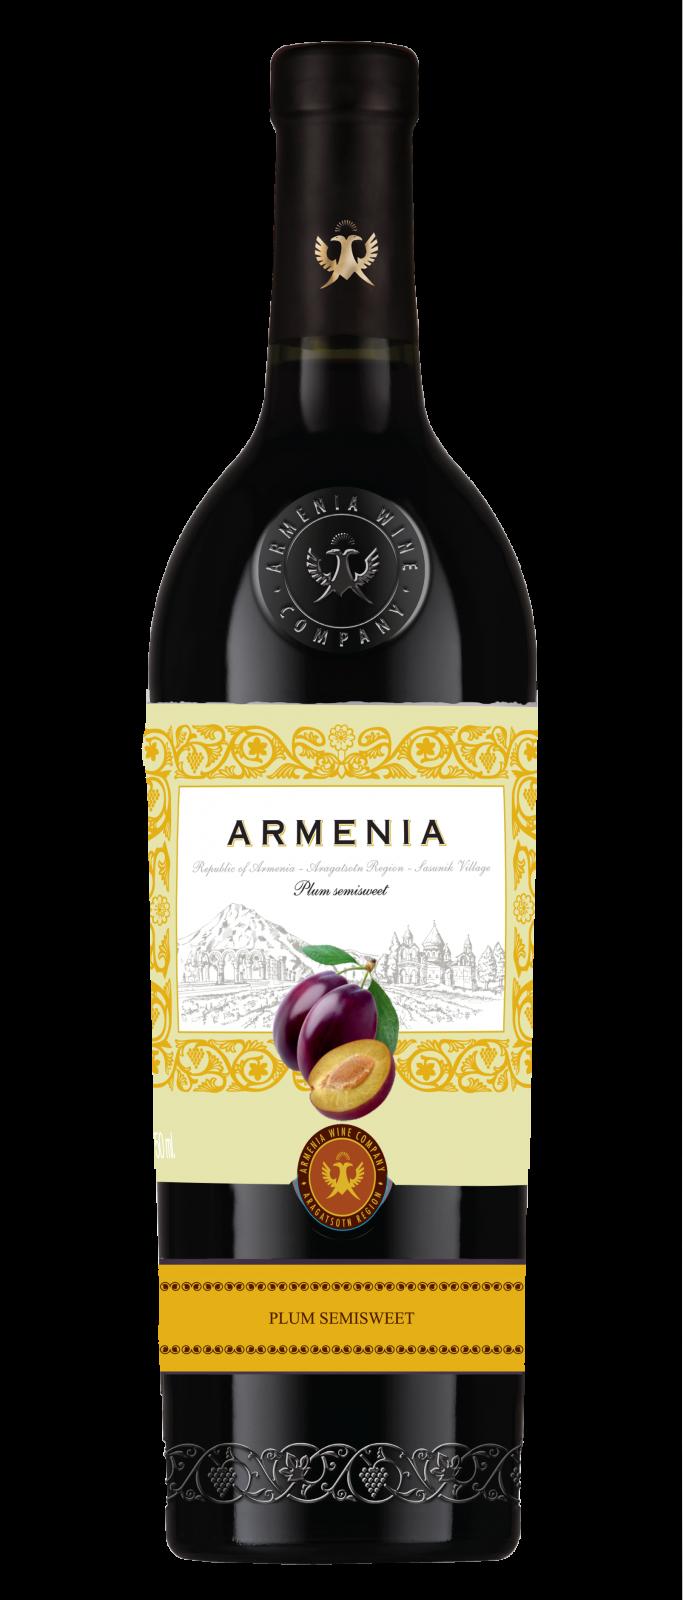 Armenia Plum Semisweet